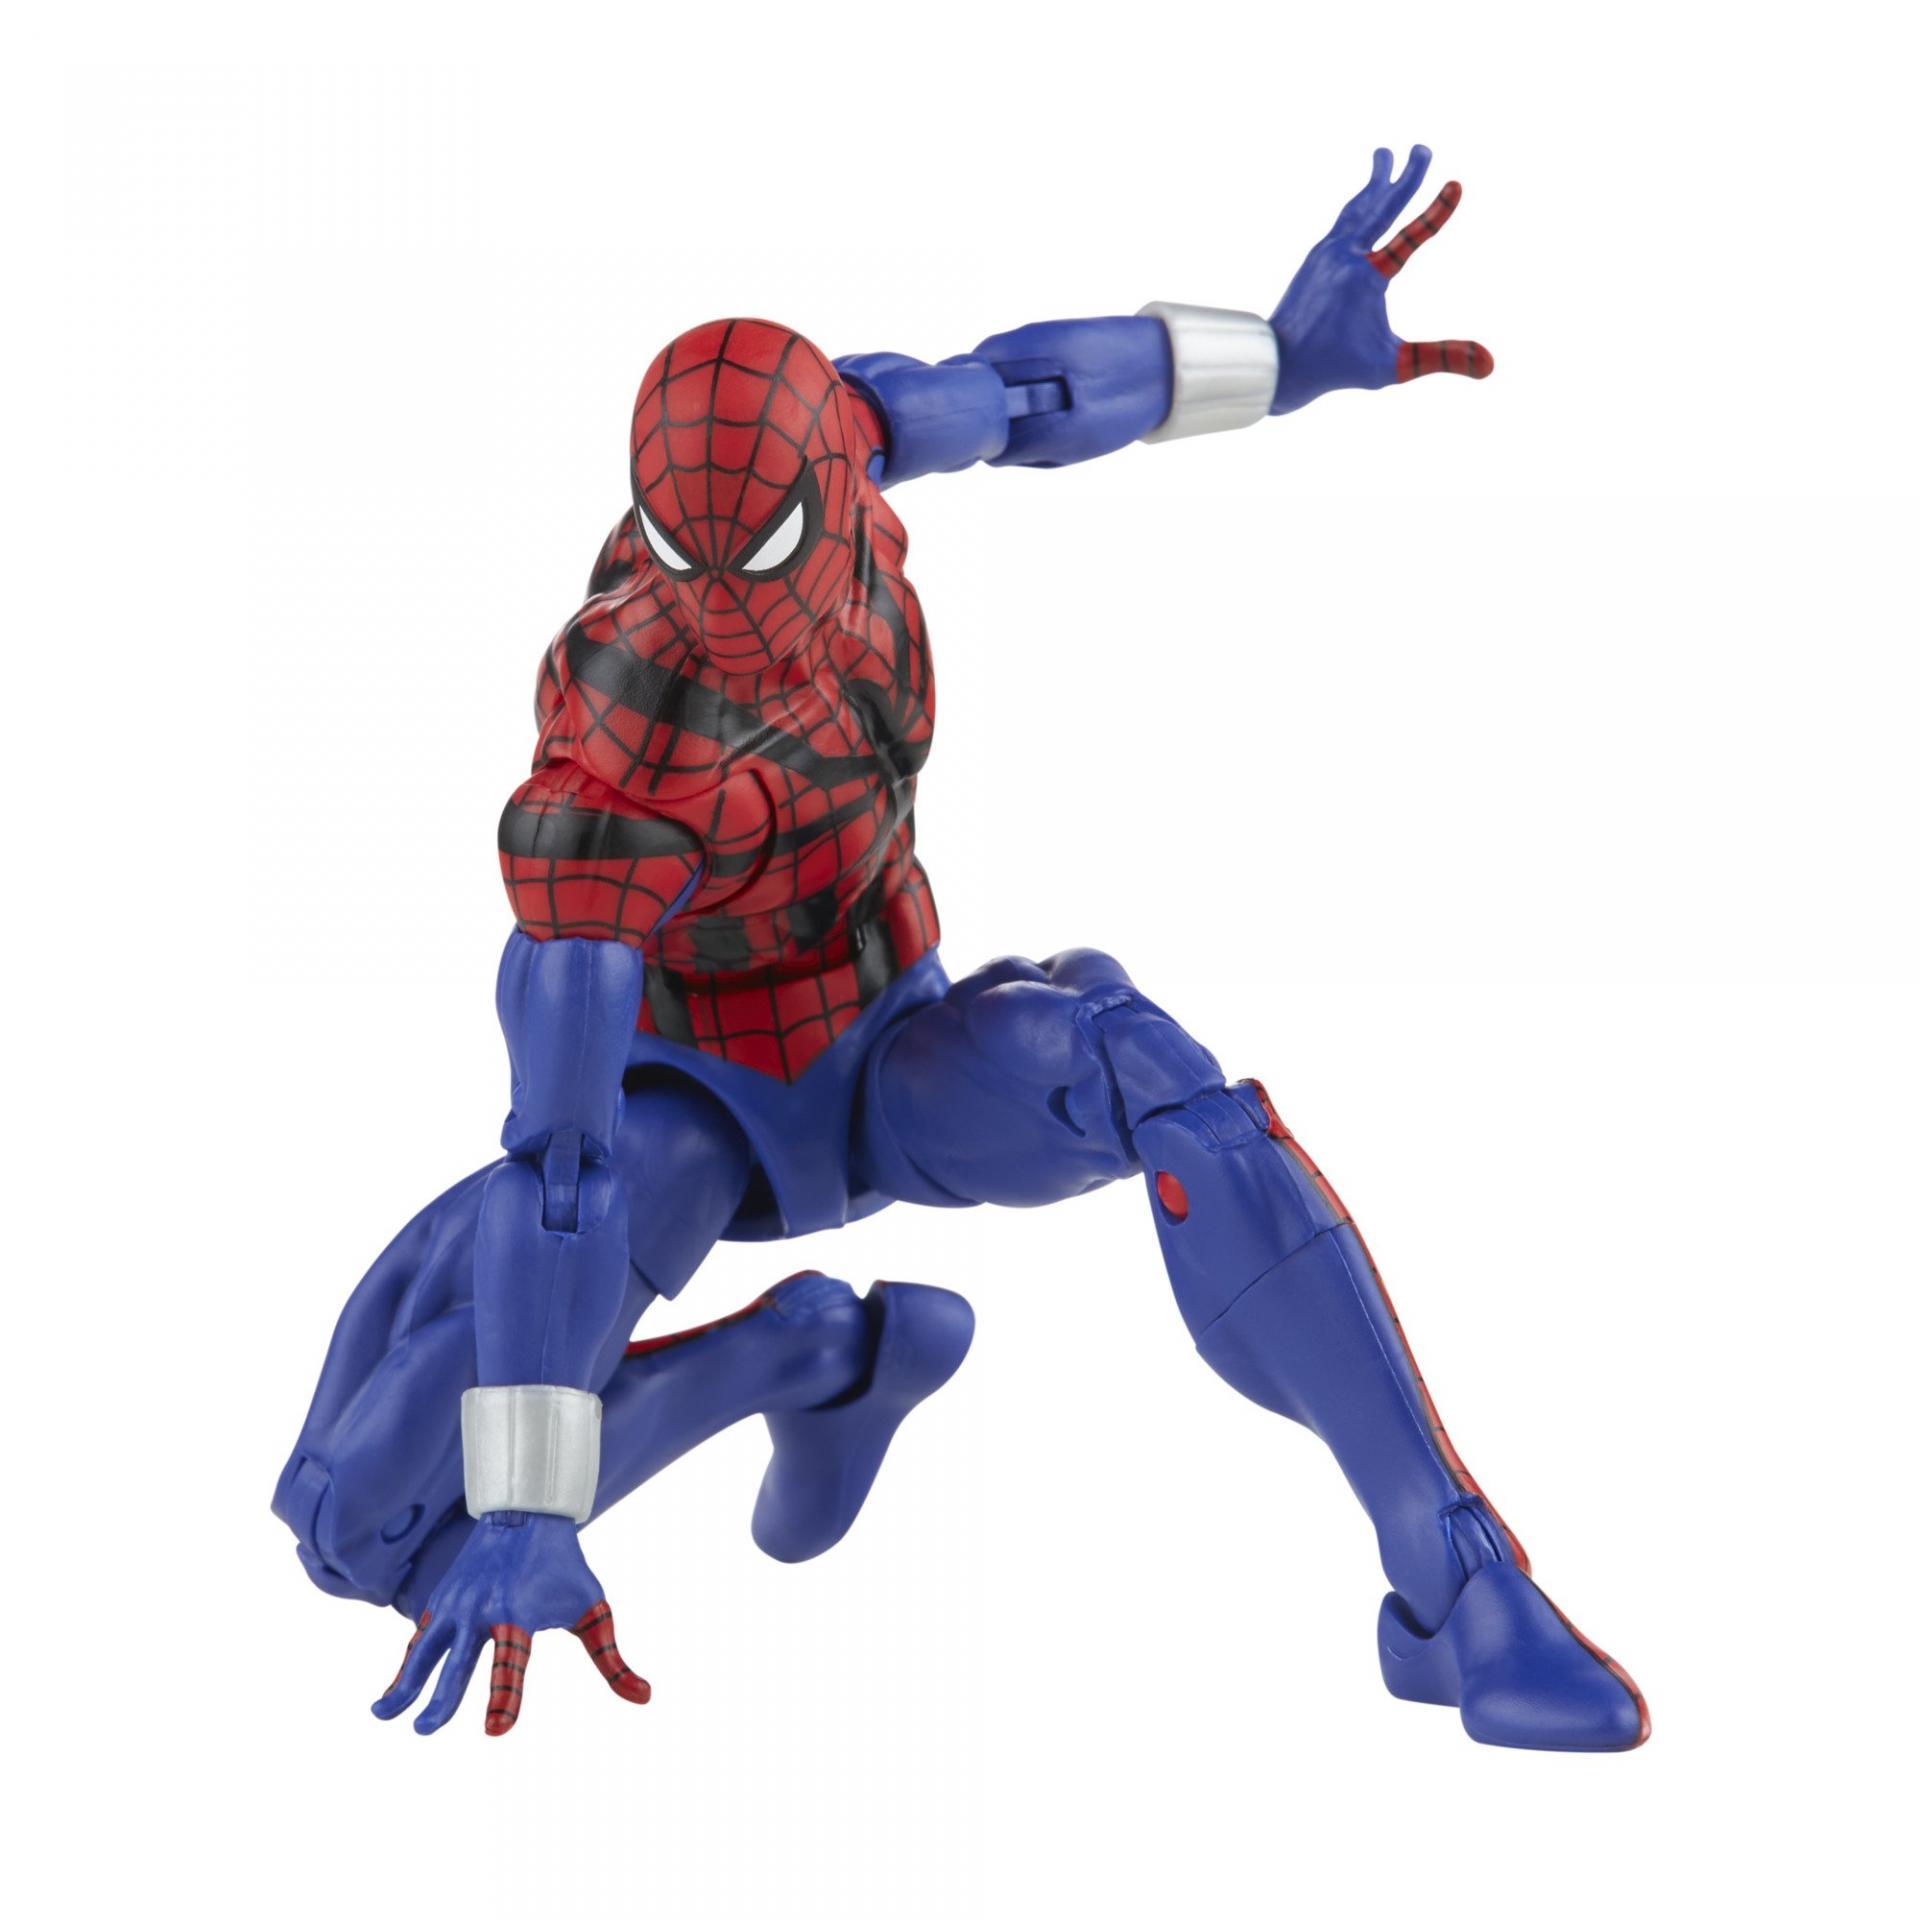 Marvel legends series hasbro spider armor mk i7